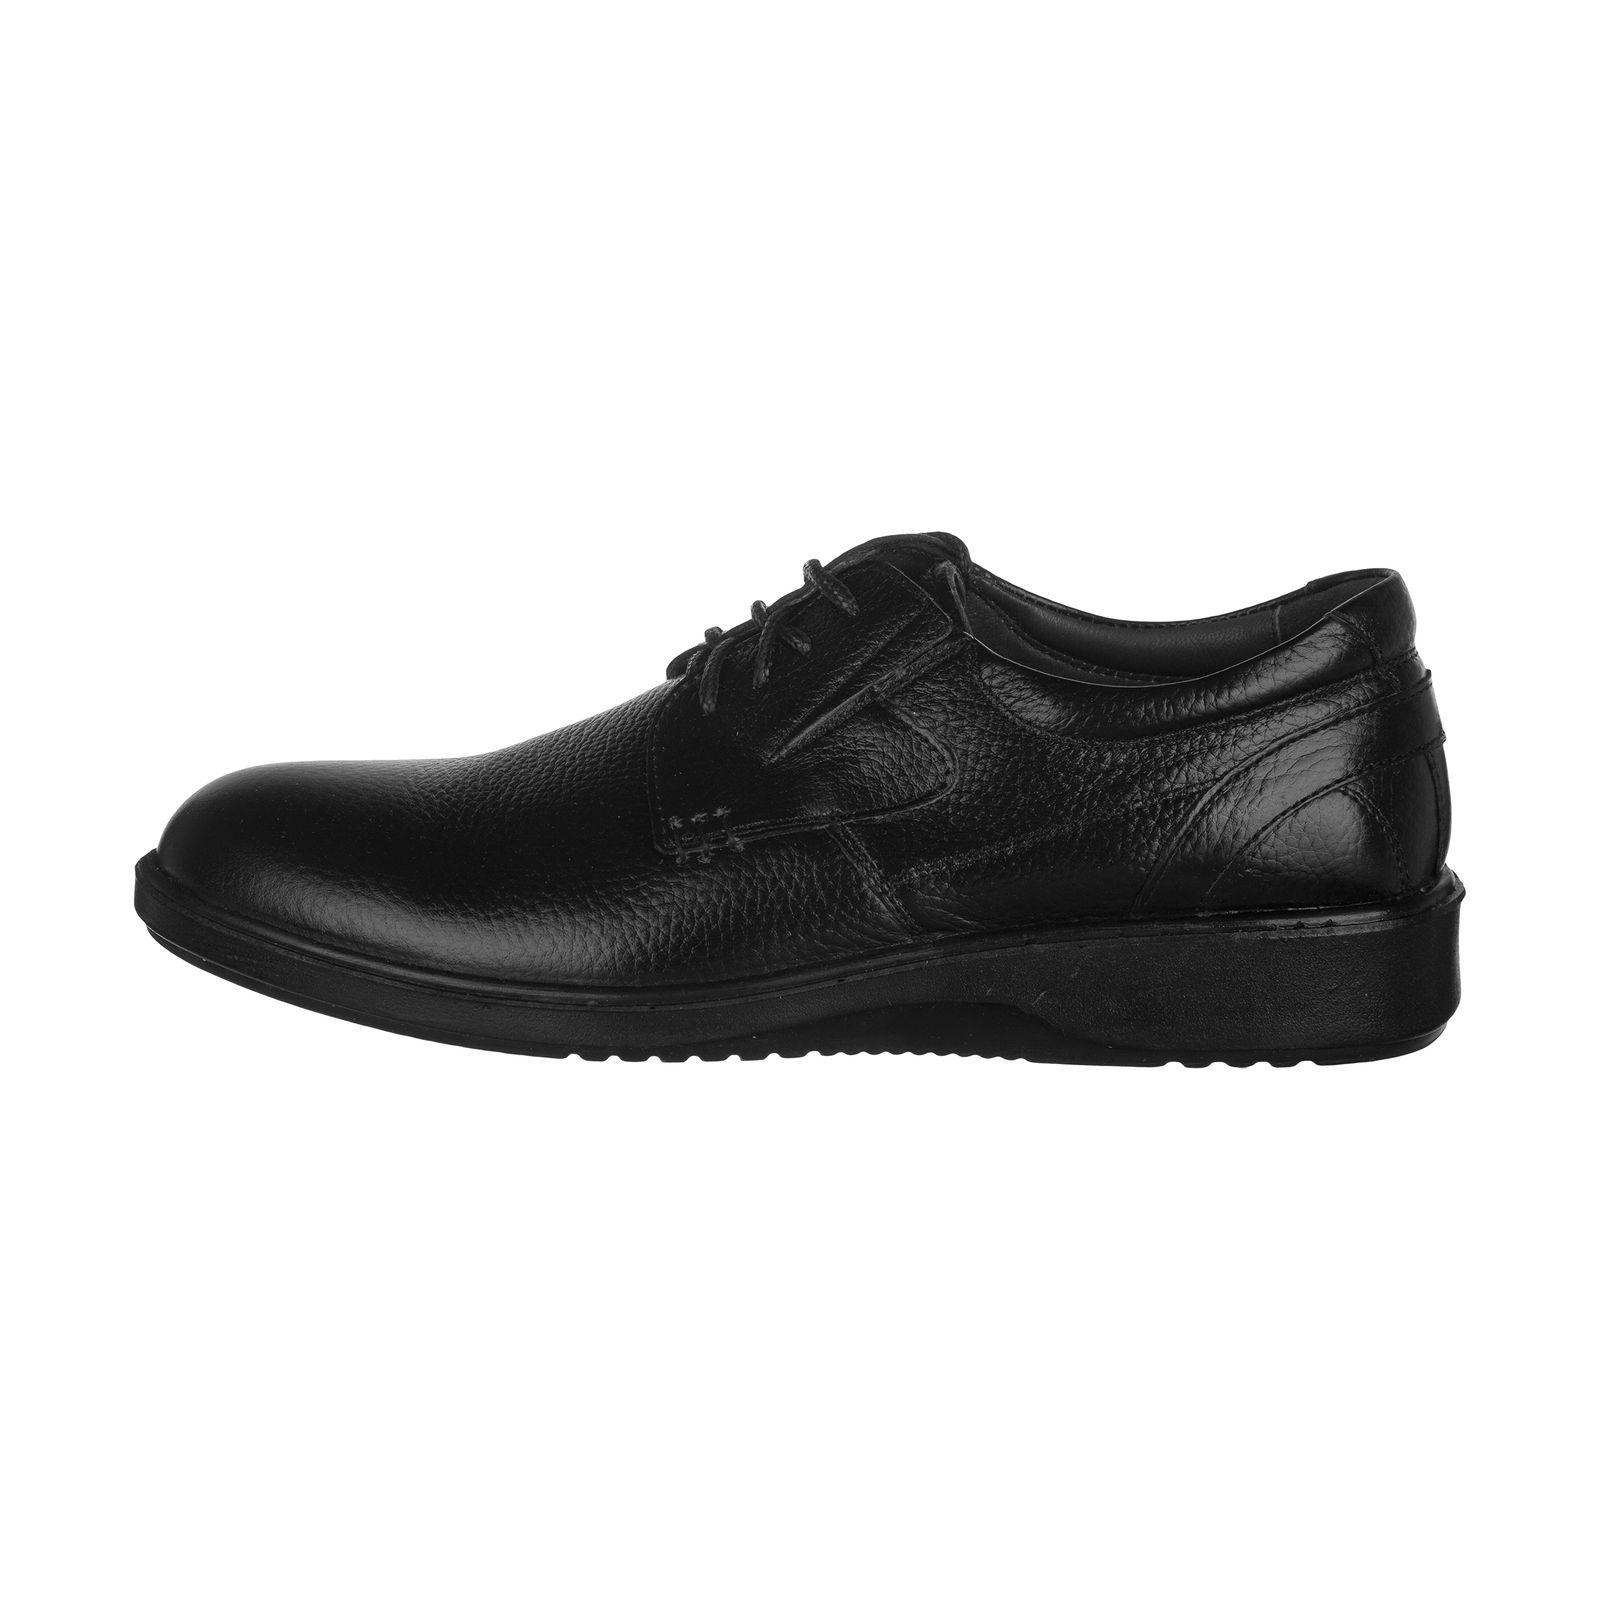 کفش روزمره مردانه آذر پلاس مدل 9438B503101 -  - 2